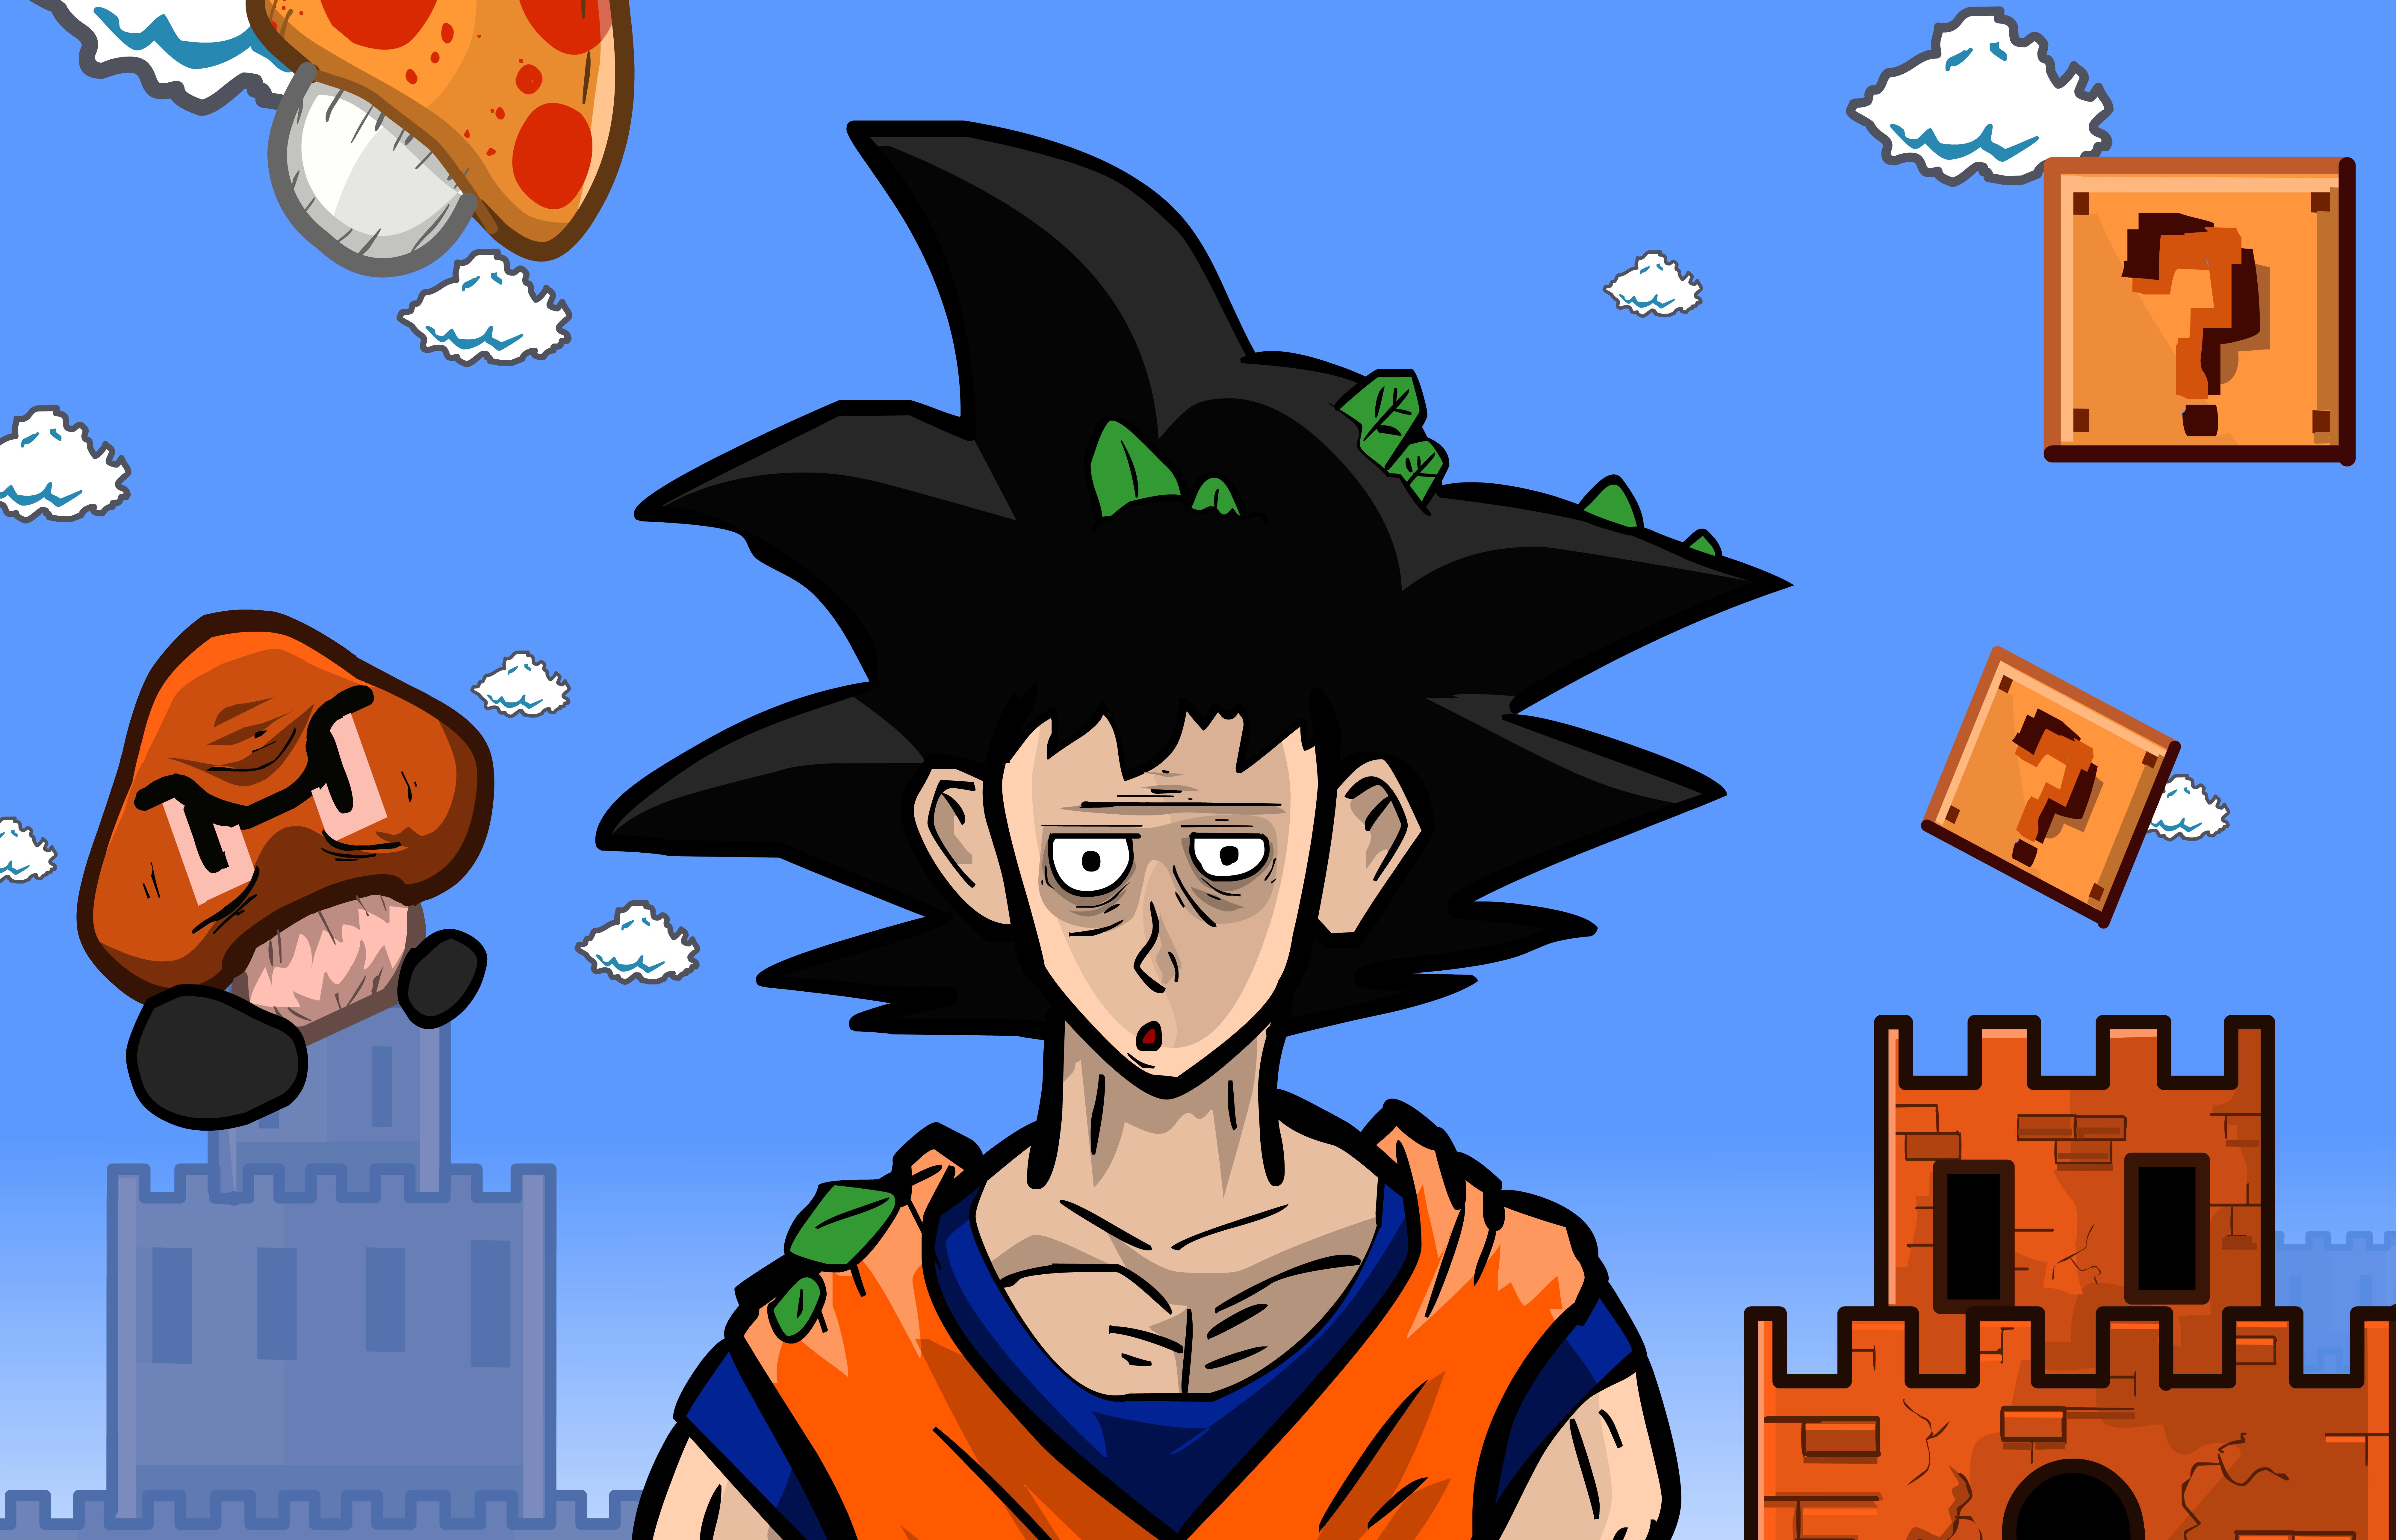 Goku in Super Mario World